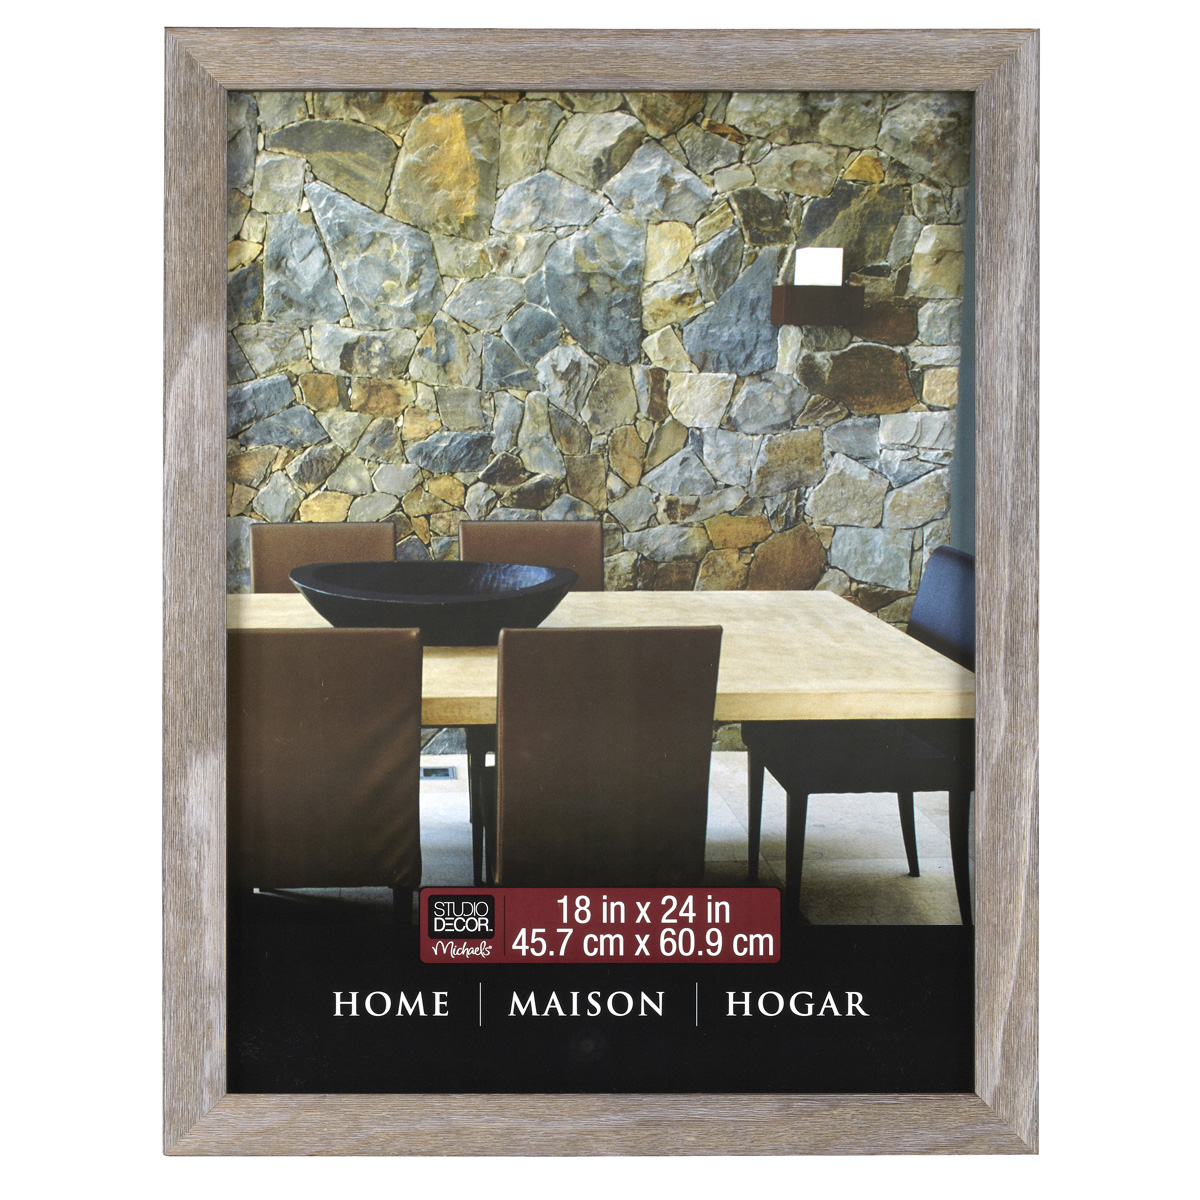 Wall Art Decor Michaels : Studio d?cor? home collection barnwood frame